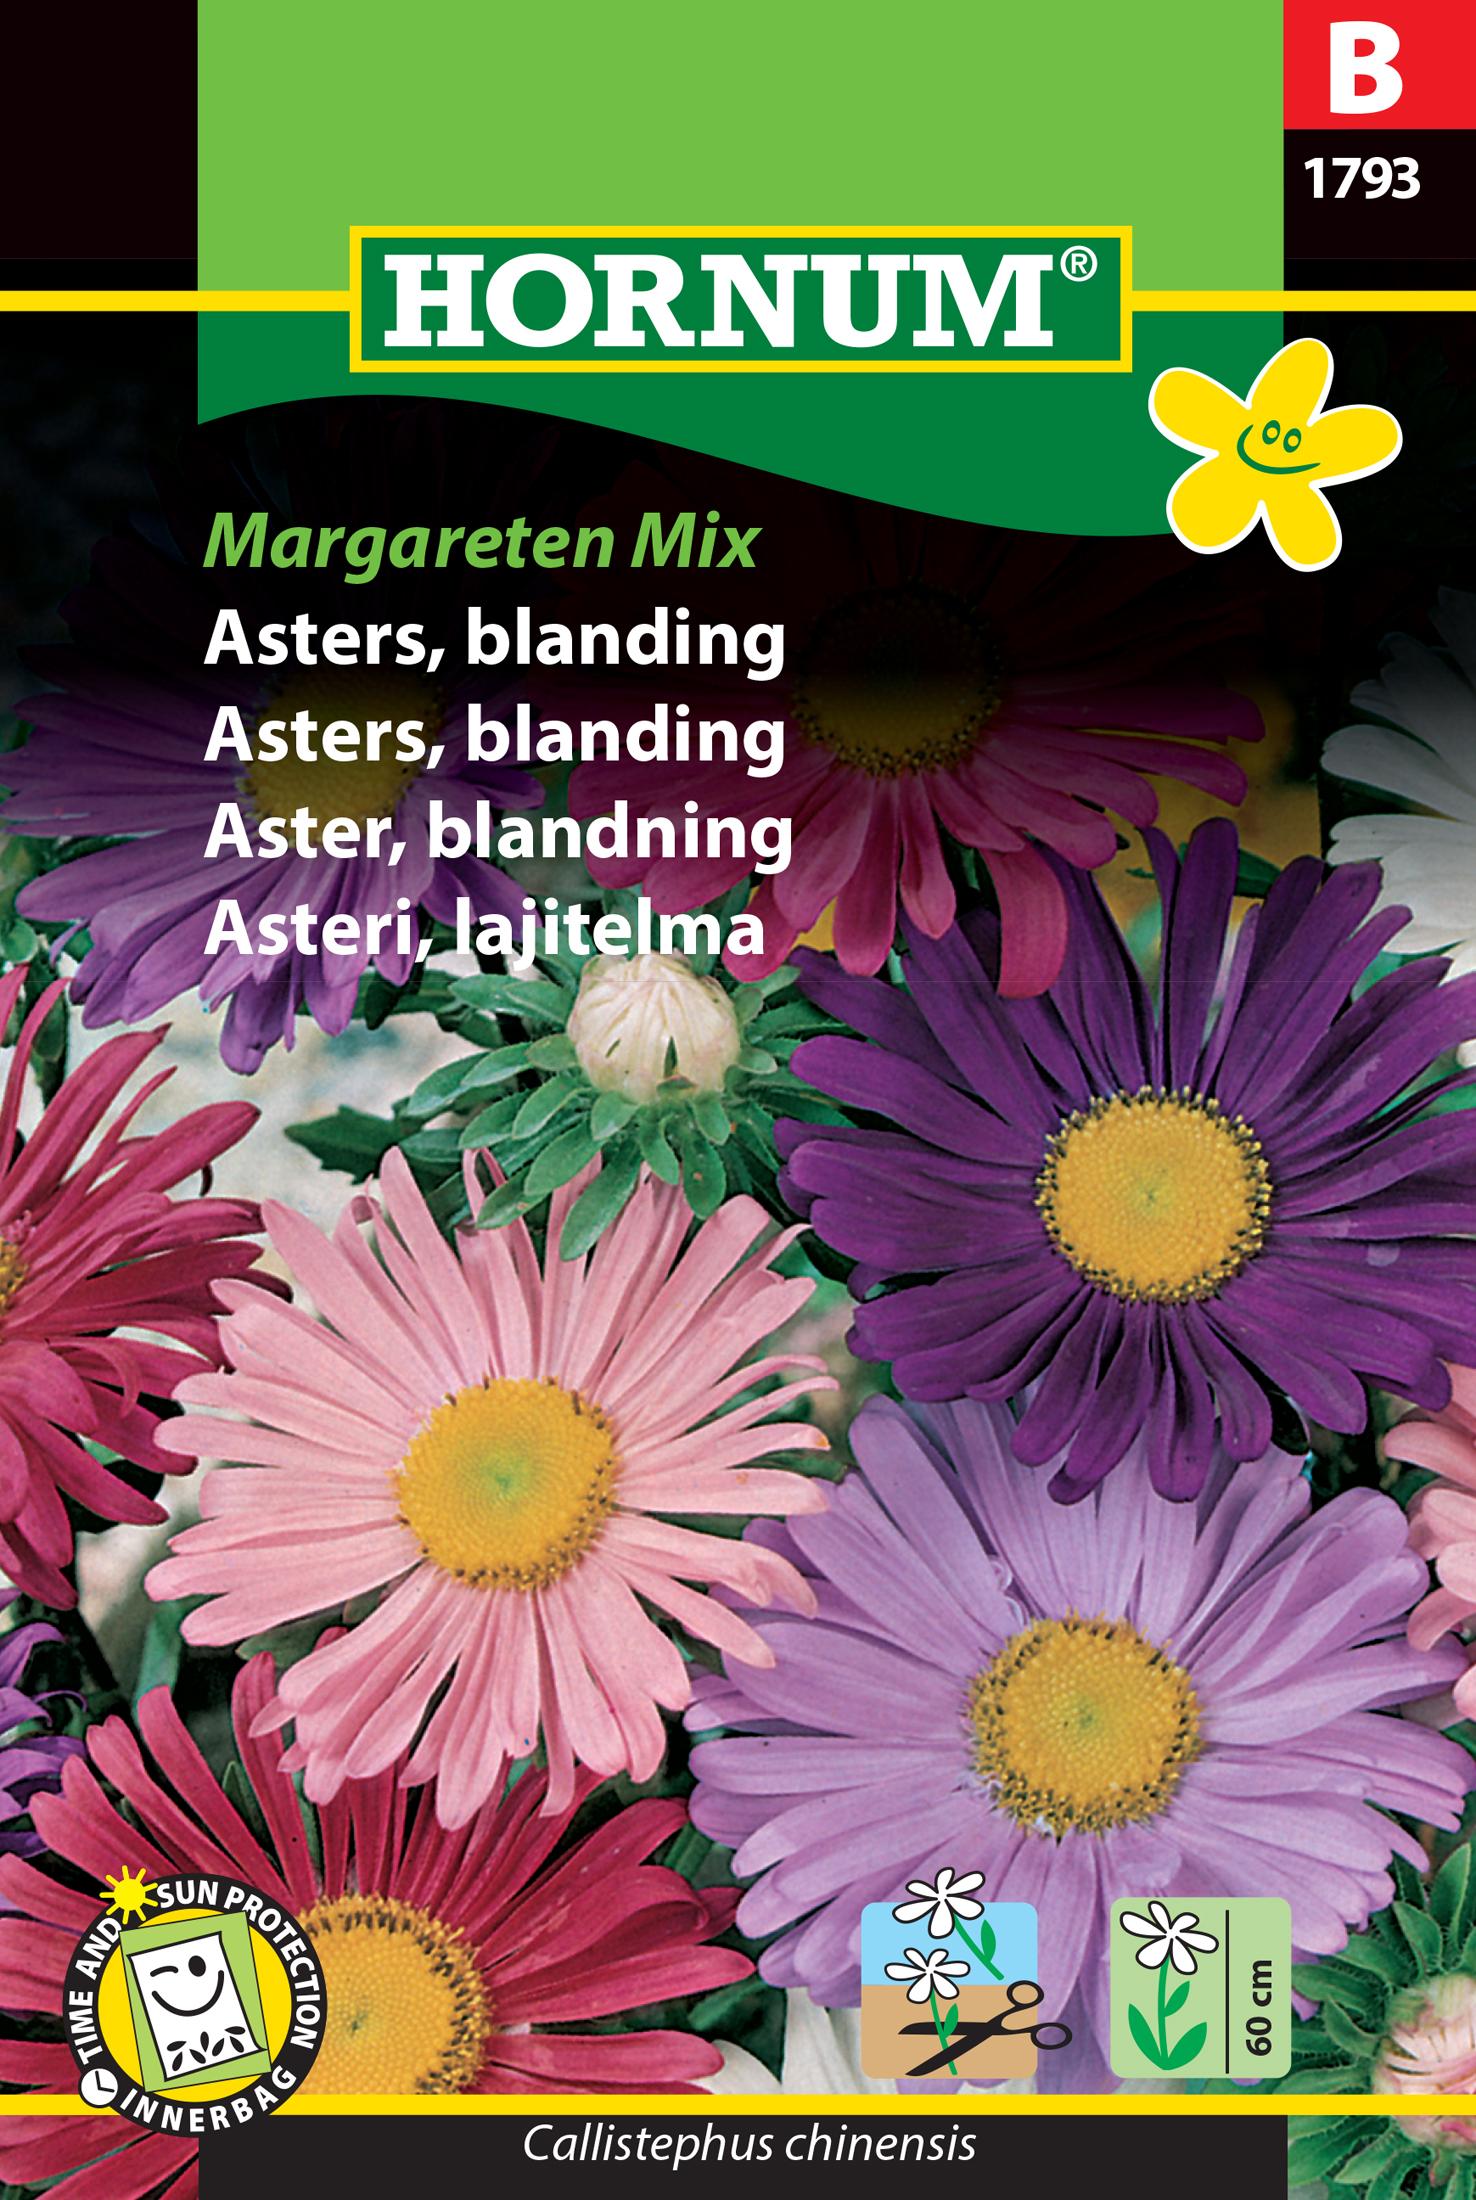 Aster, blandning 'Margareten